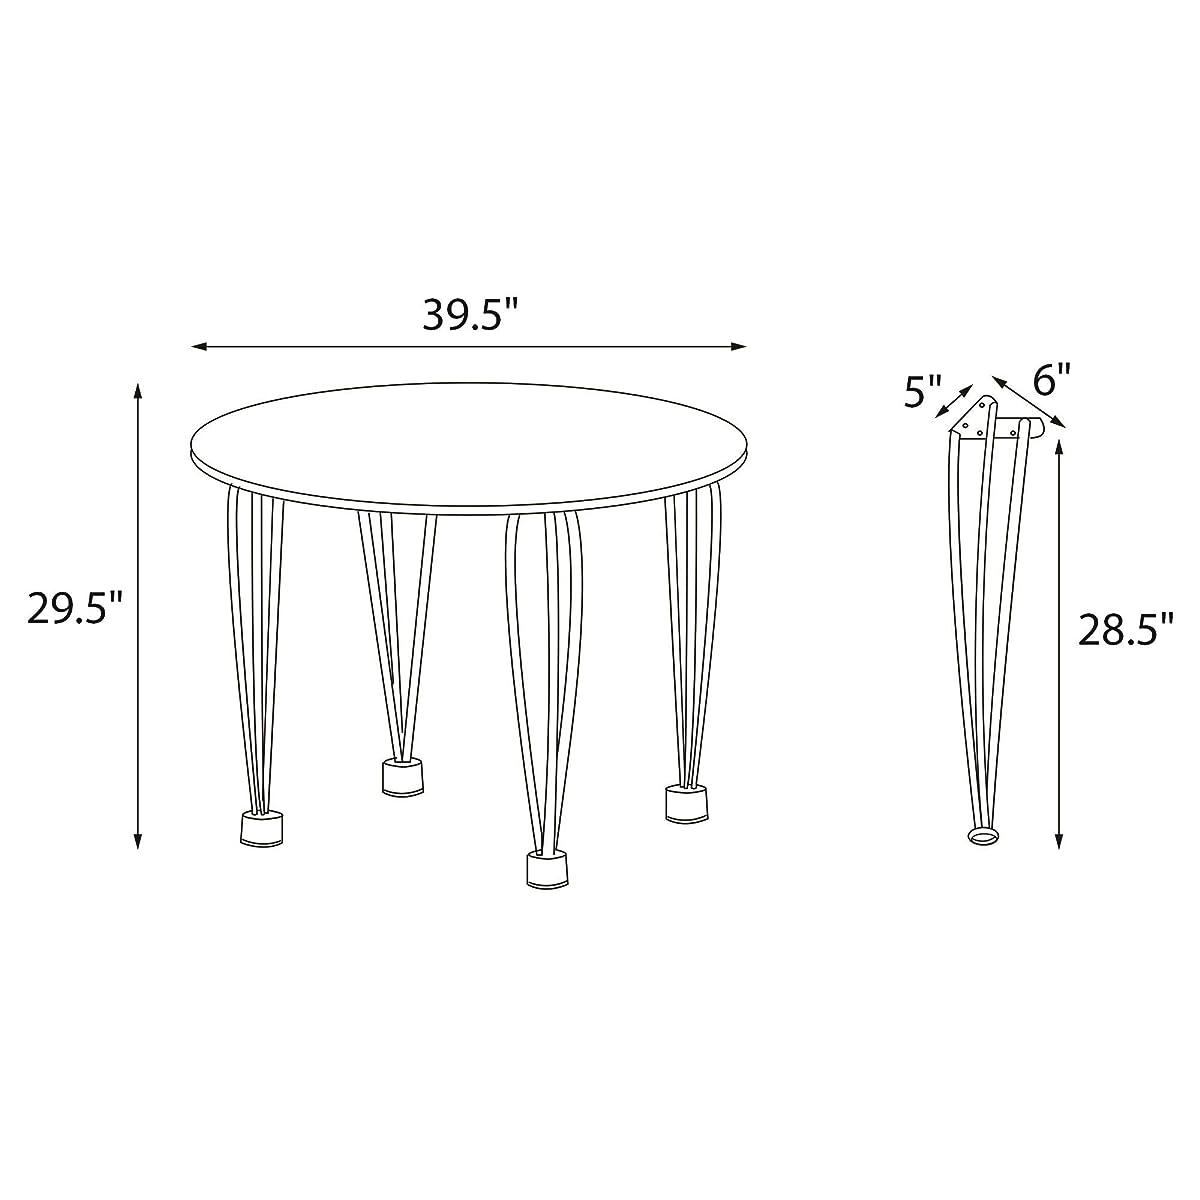 Novogratz Round Dining Table with Chrome Plated Legs, White